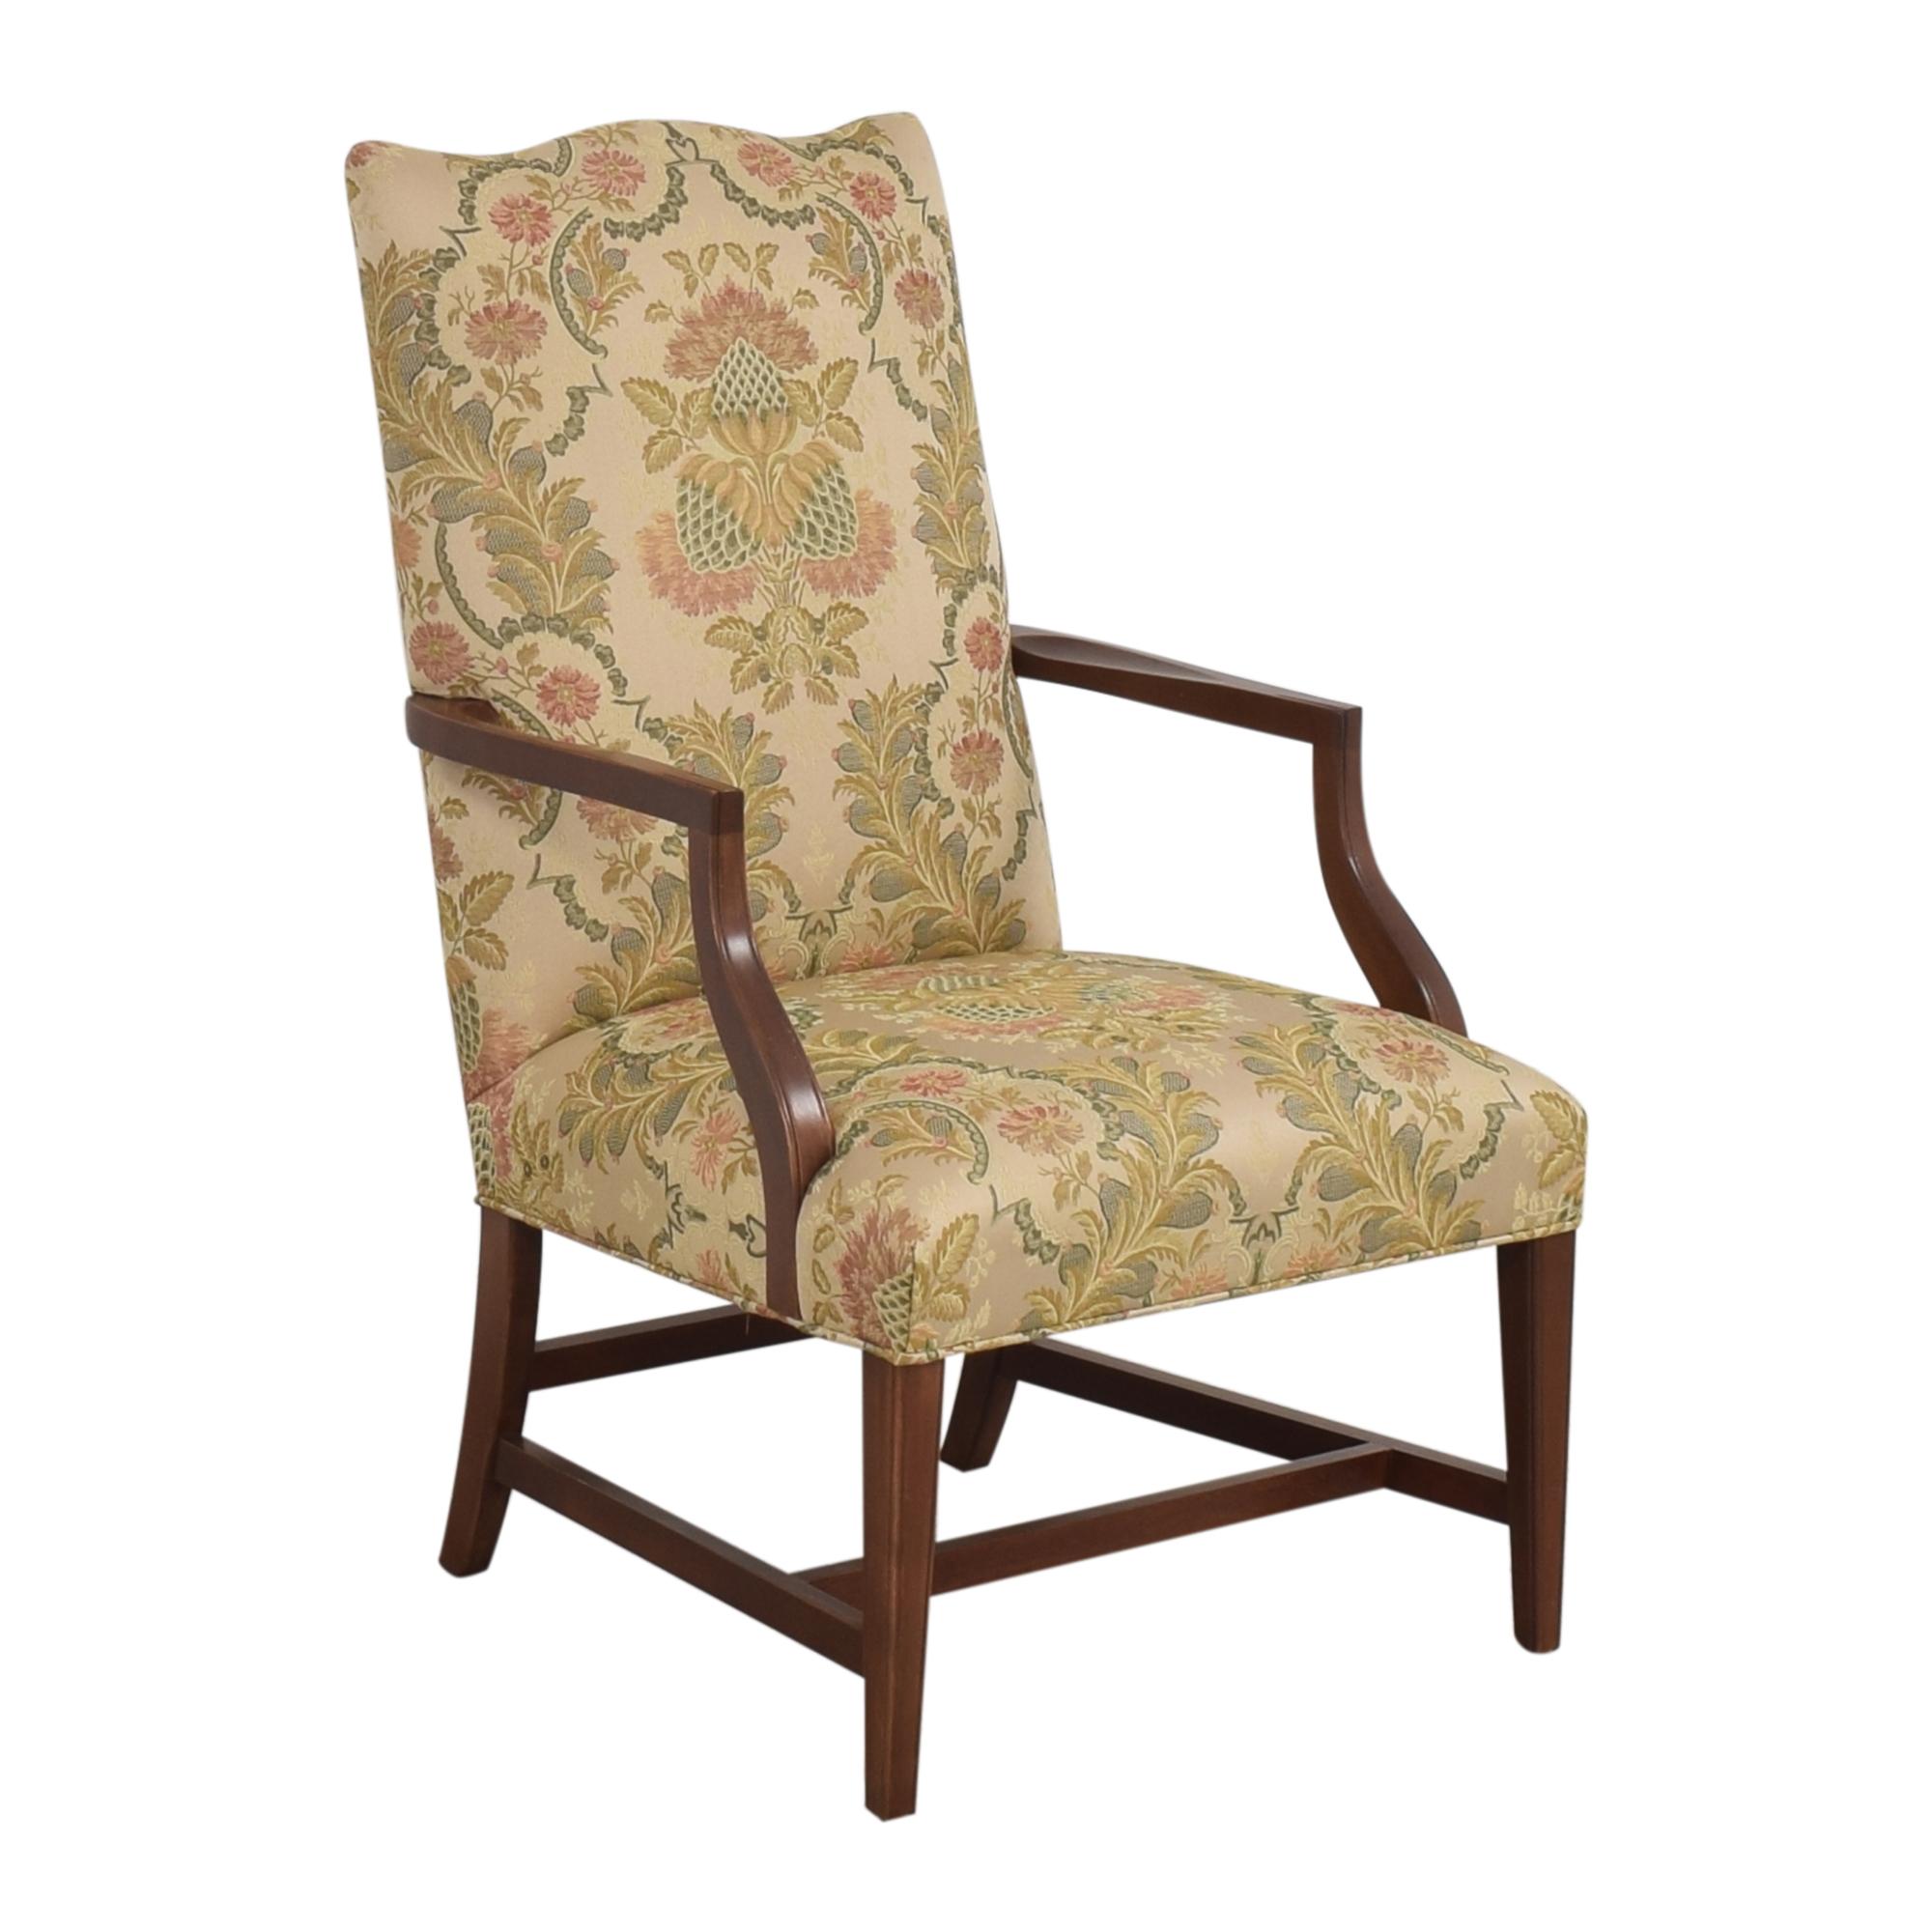 Ethan Allen Ethan Allen Martha Washington Arm Chair for sale